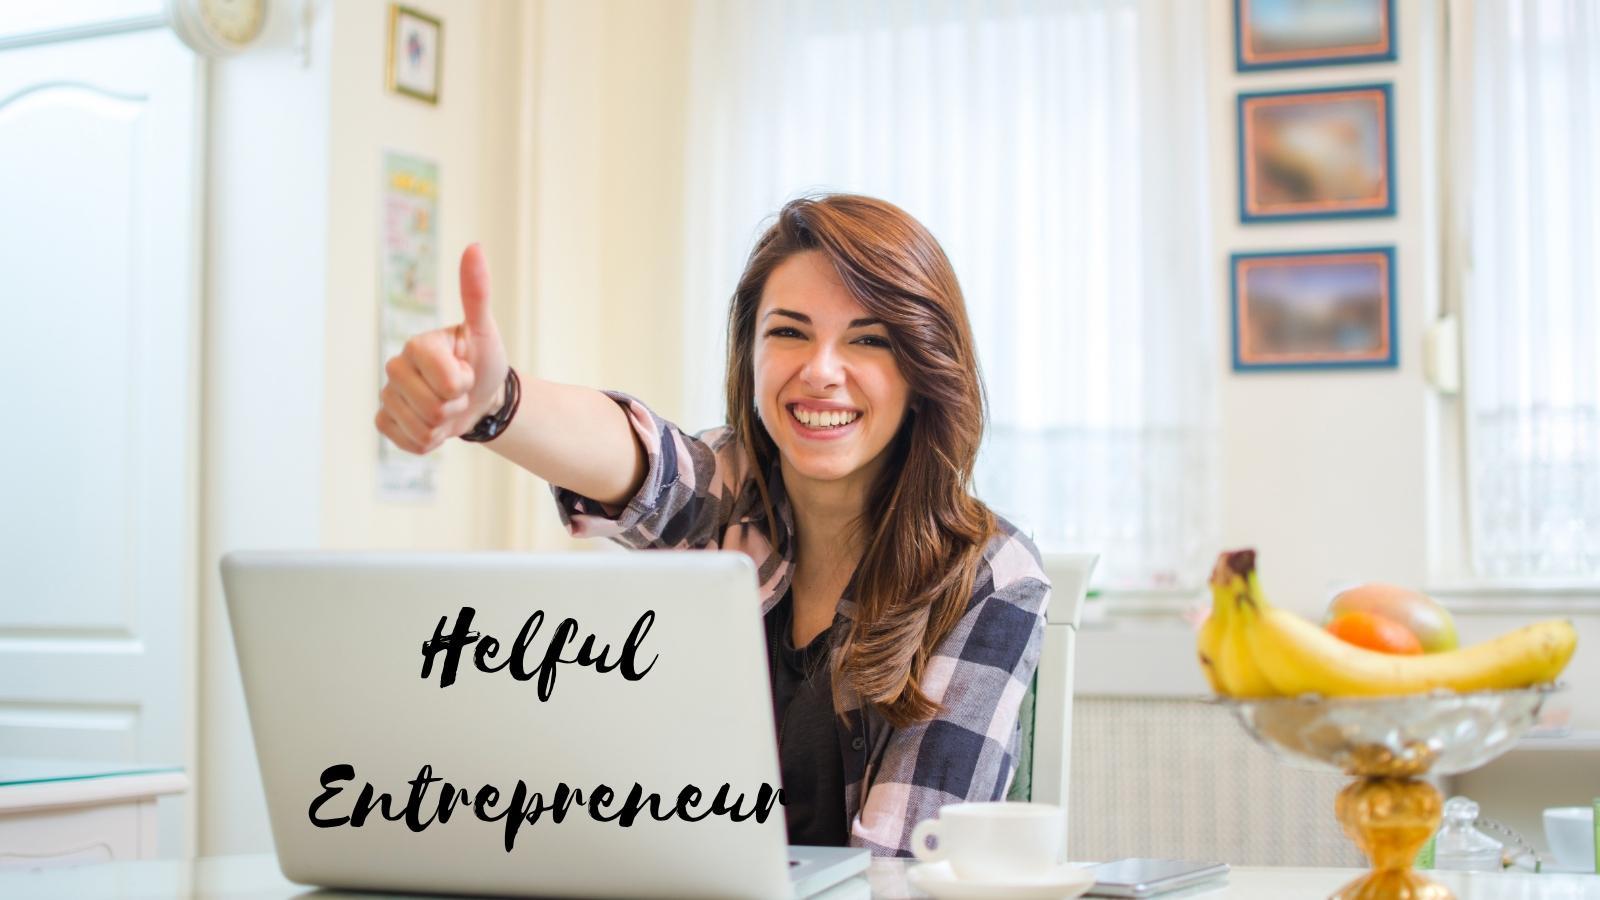 a helpful entrepreneur